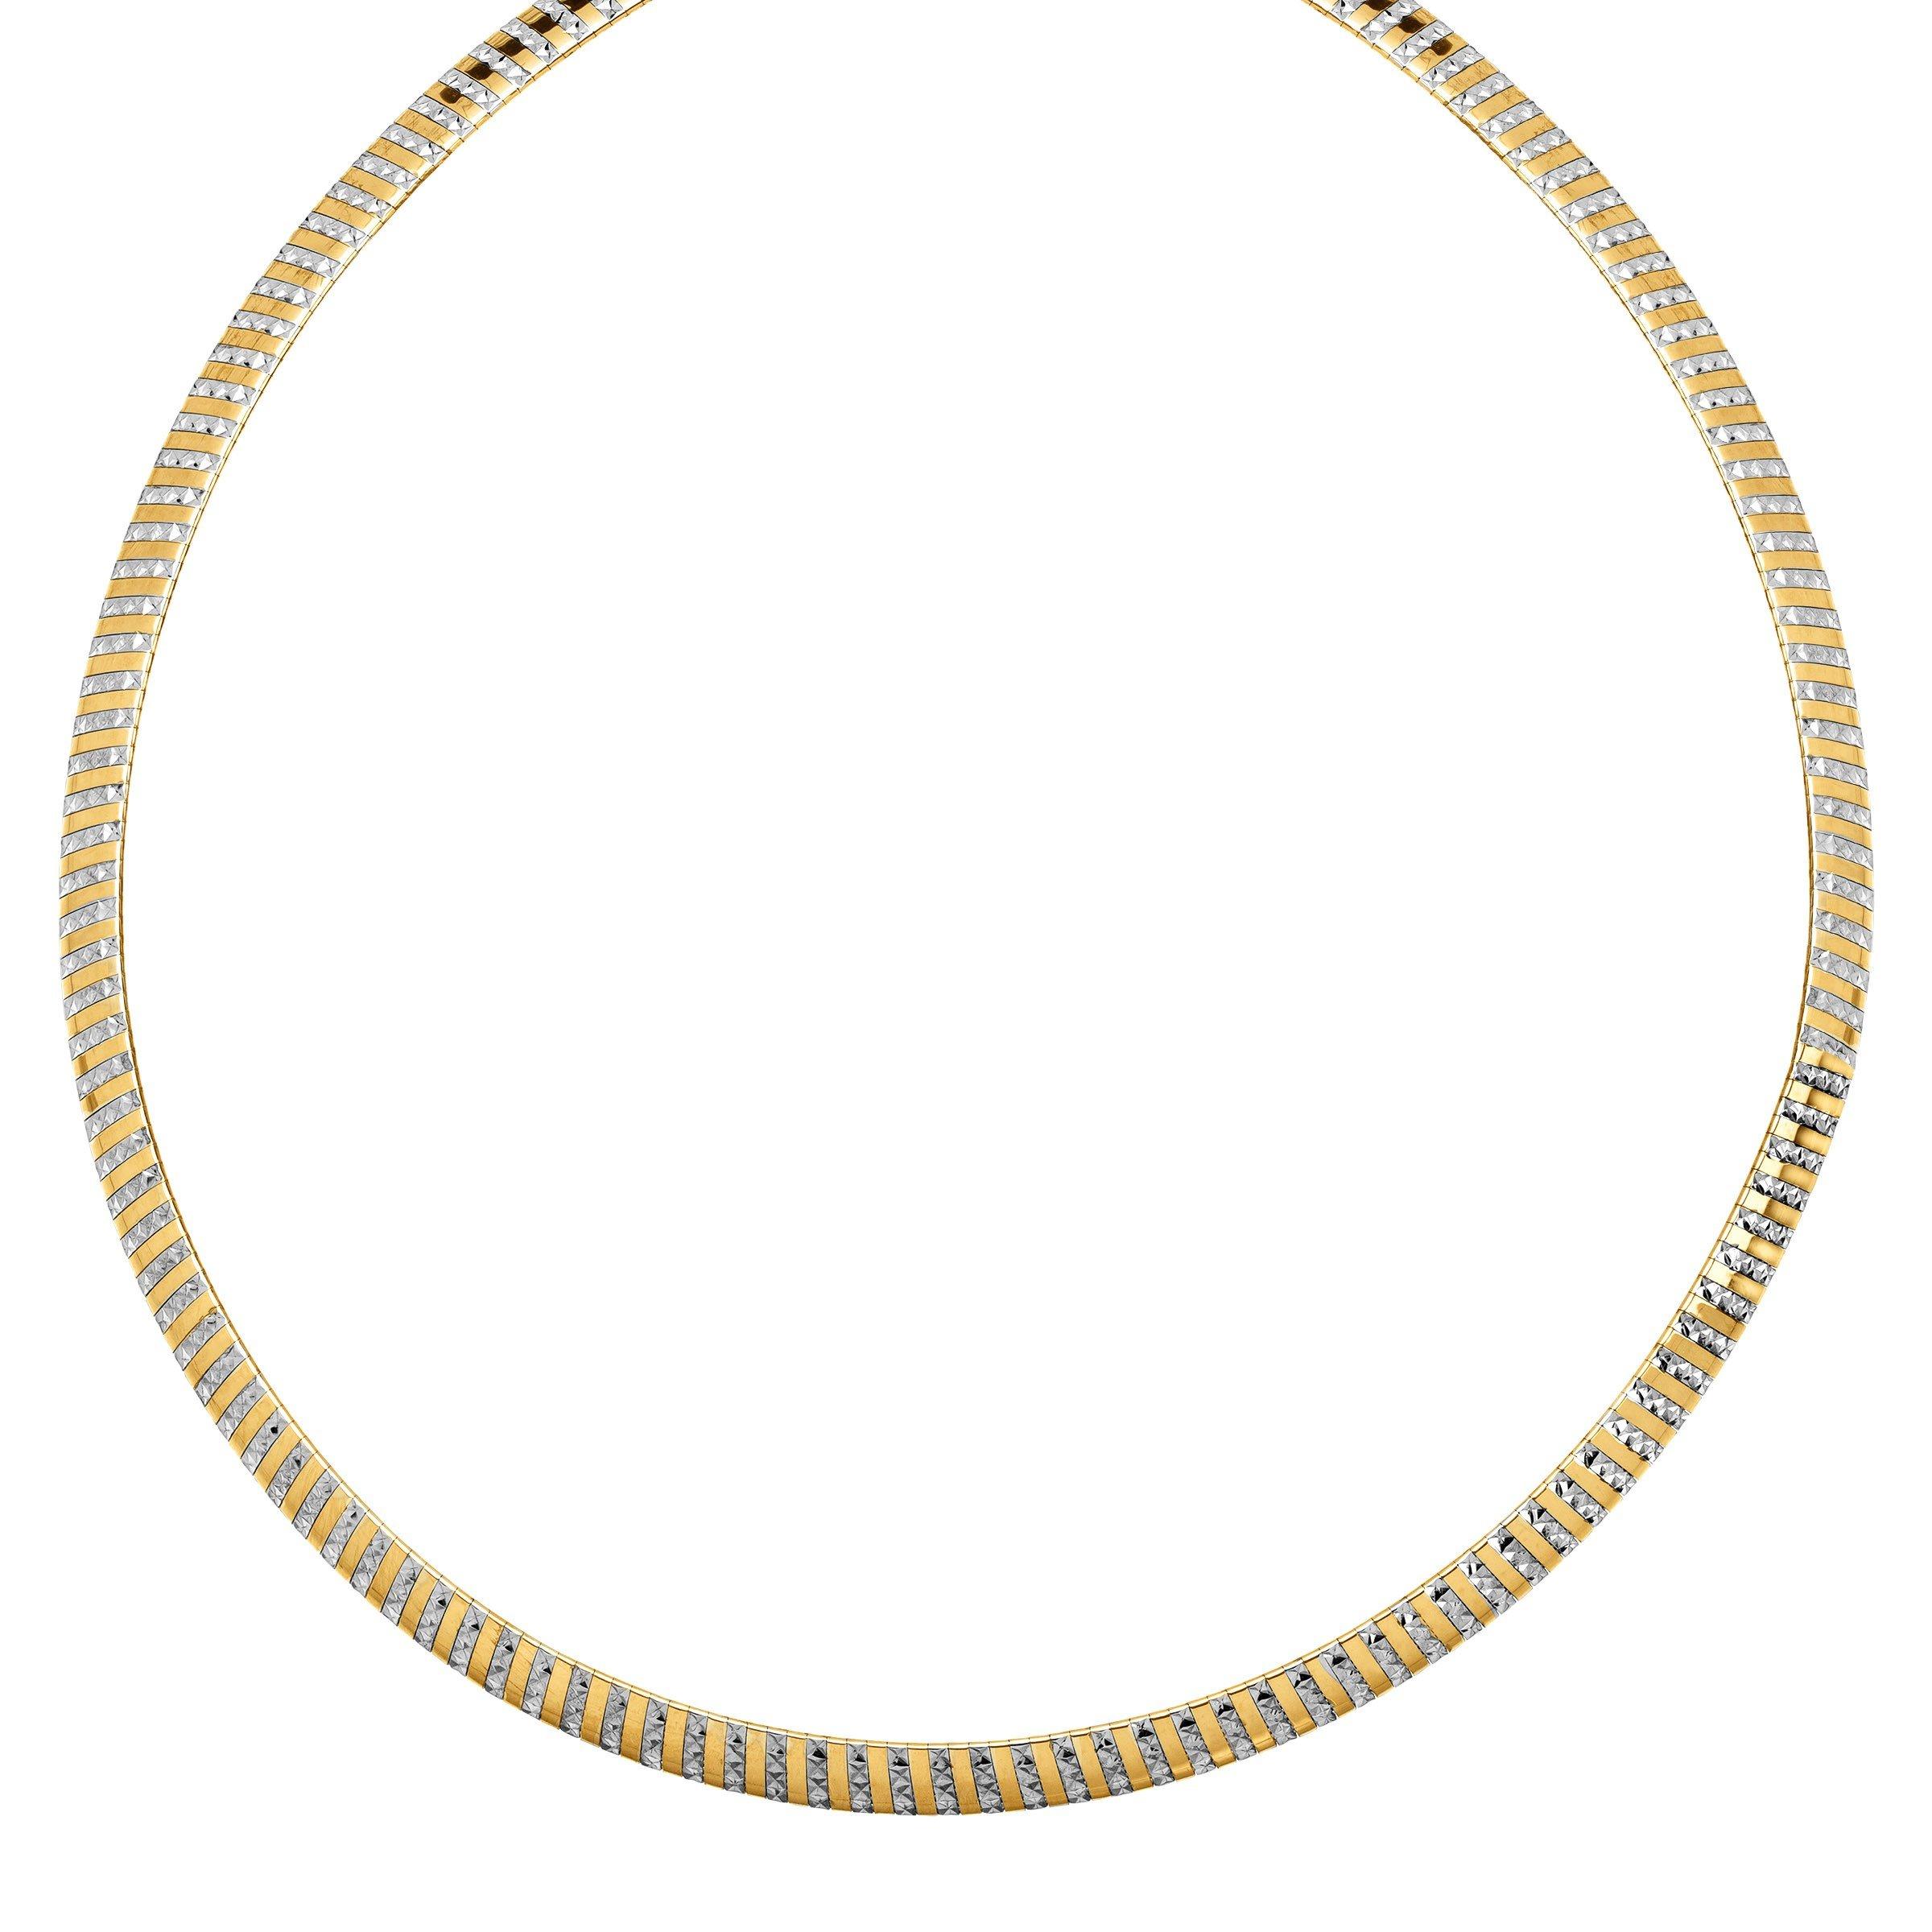 Reversible Avolto Omega Chain Necklace in 14K Gold-Bonded Sterling Silver